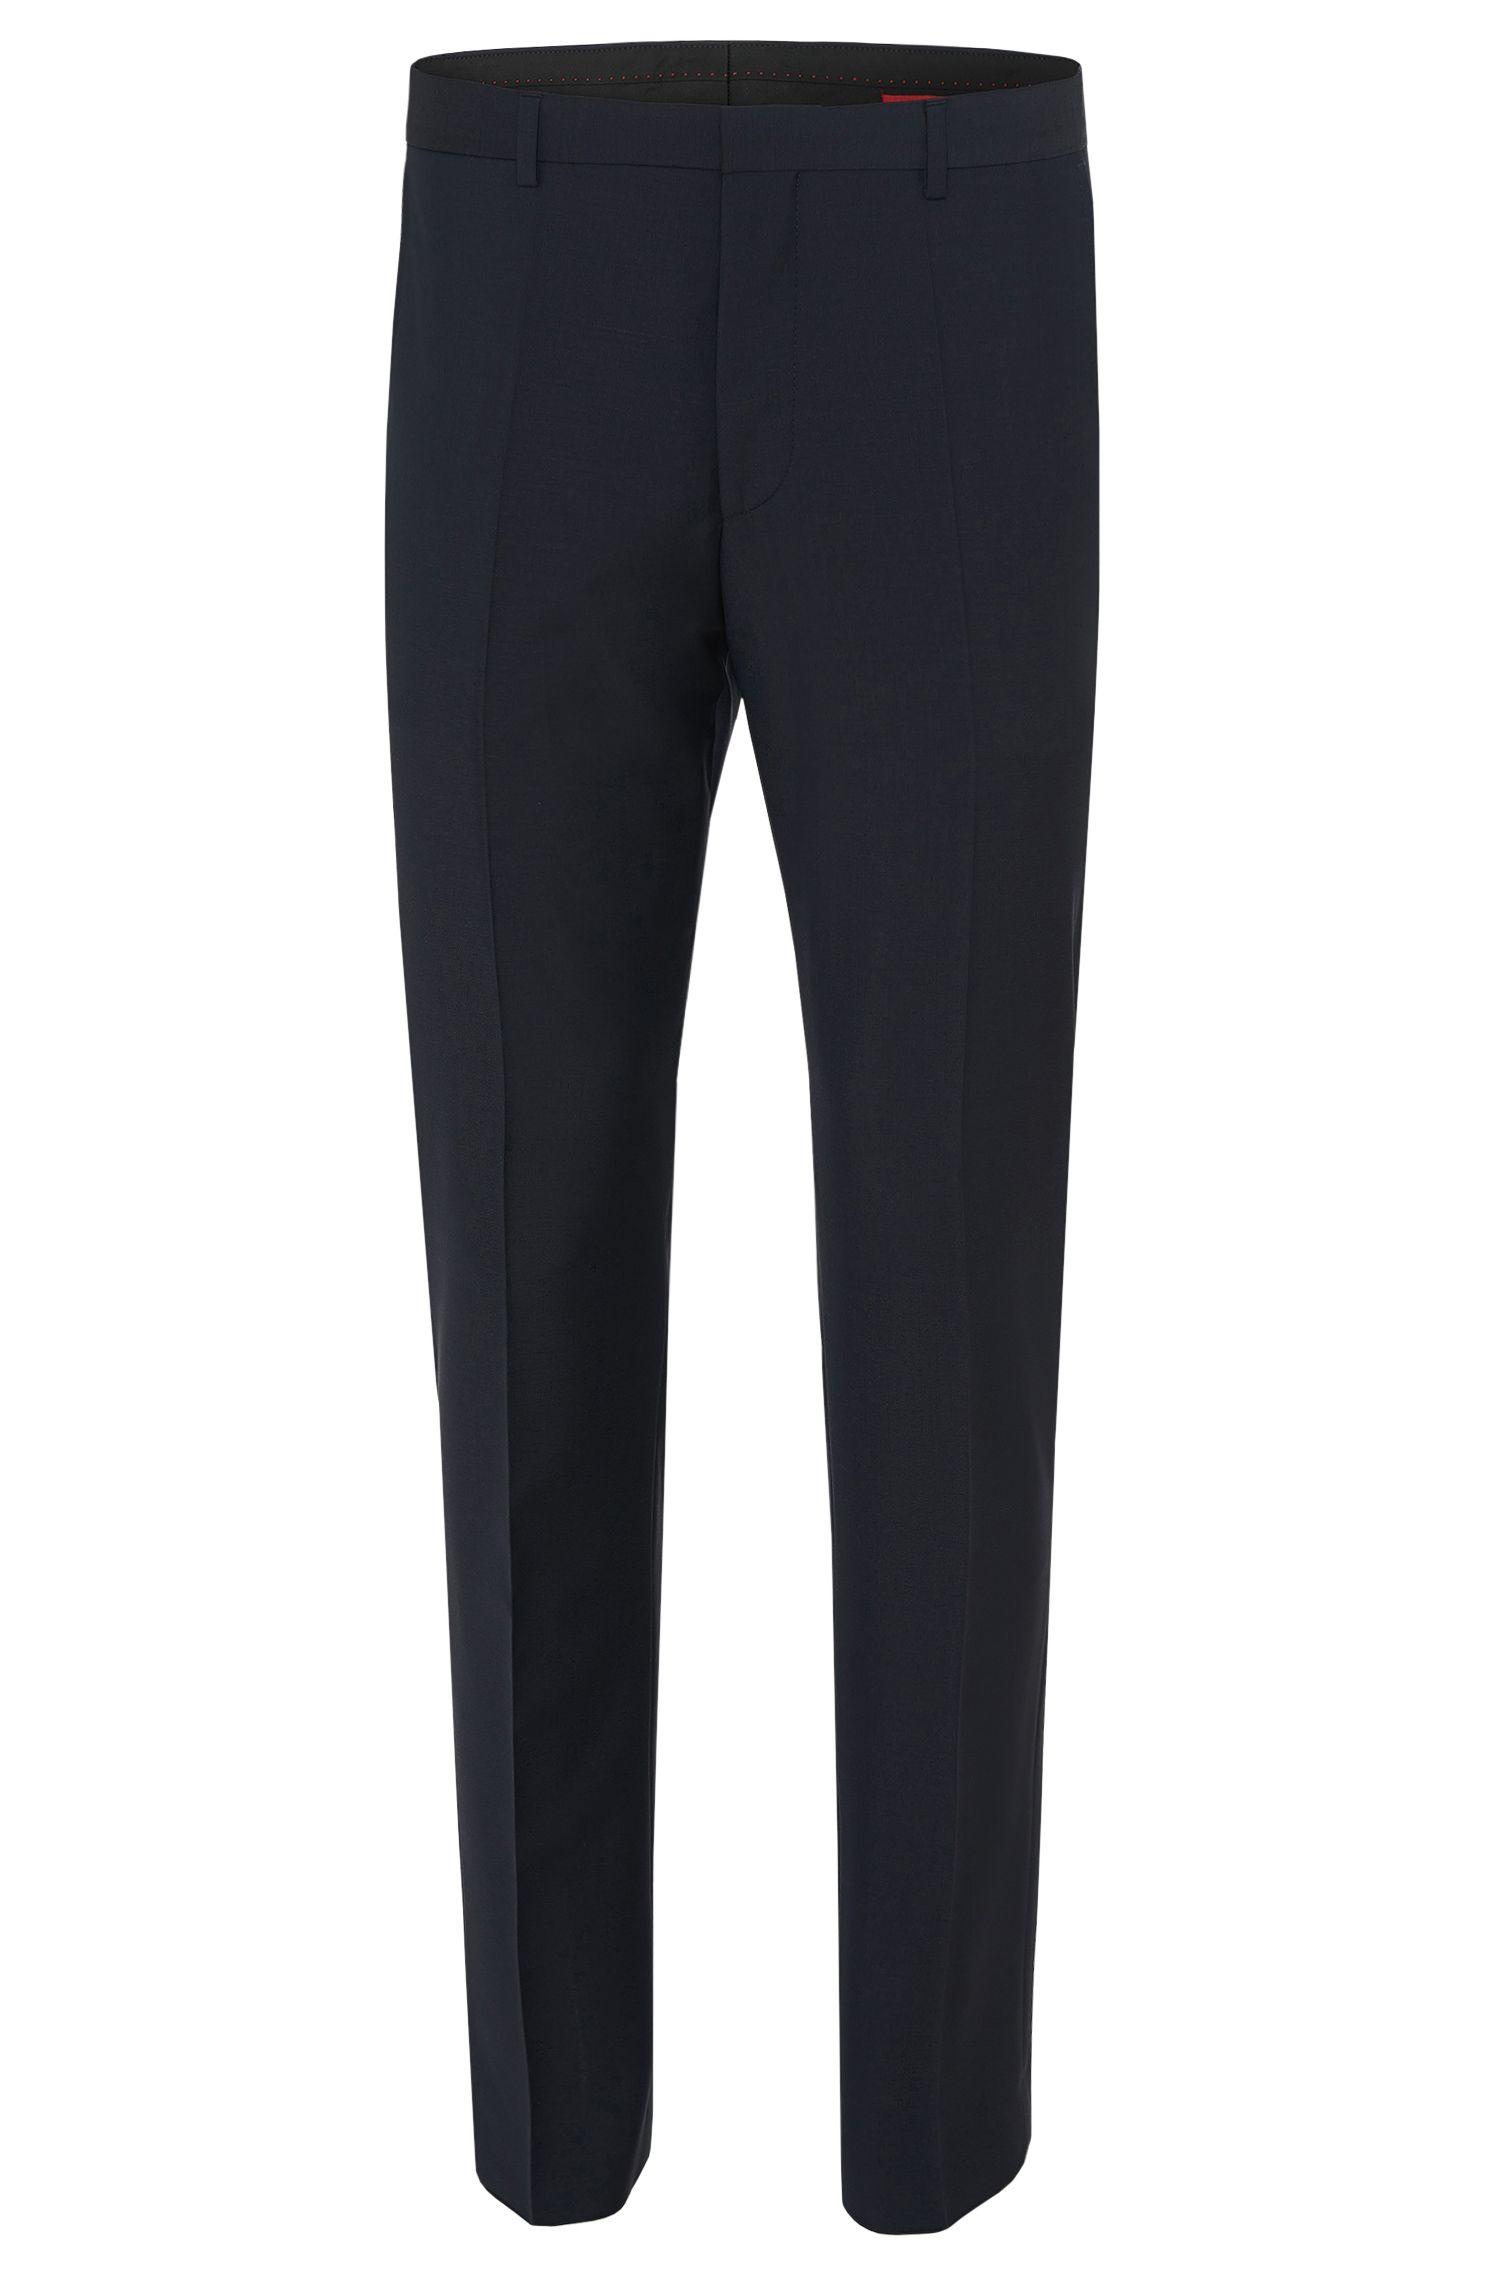 'HamenS' | Slim Fit, Virgin Wool Dress Pants